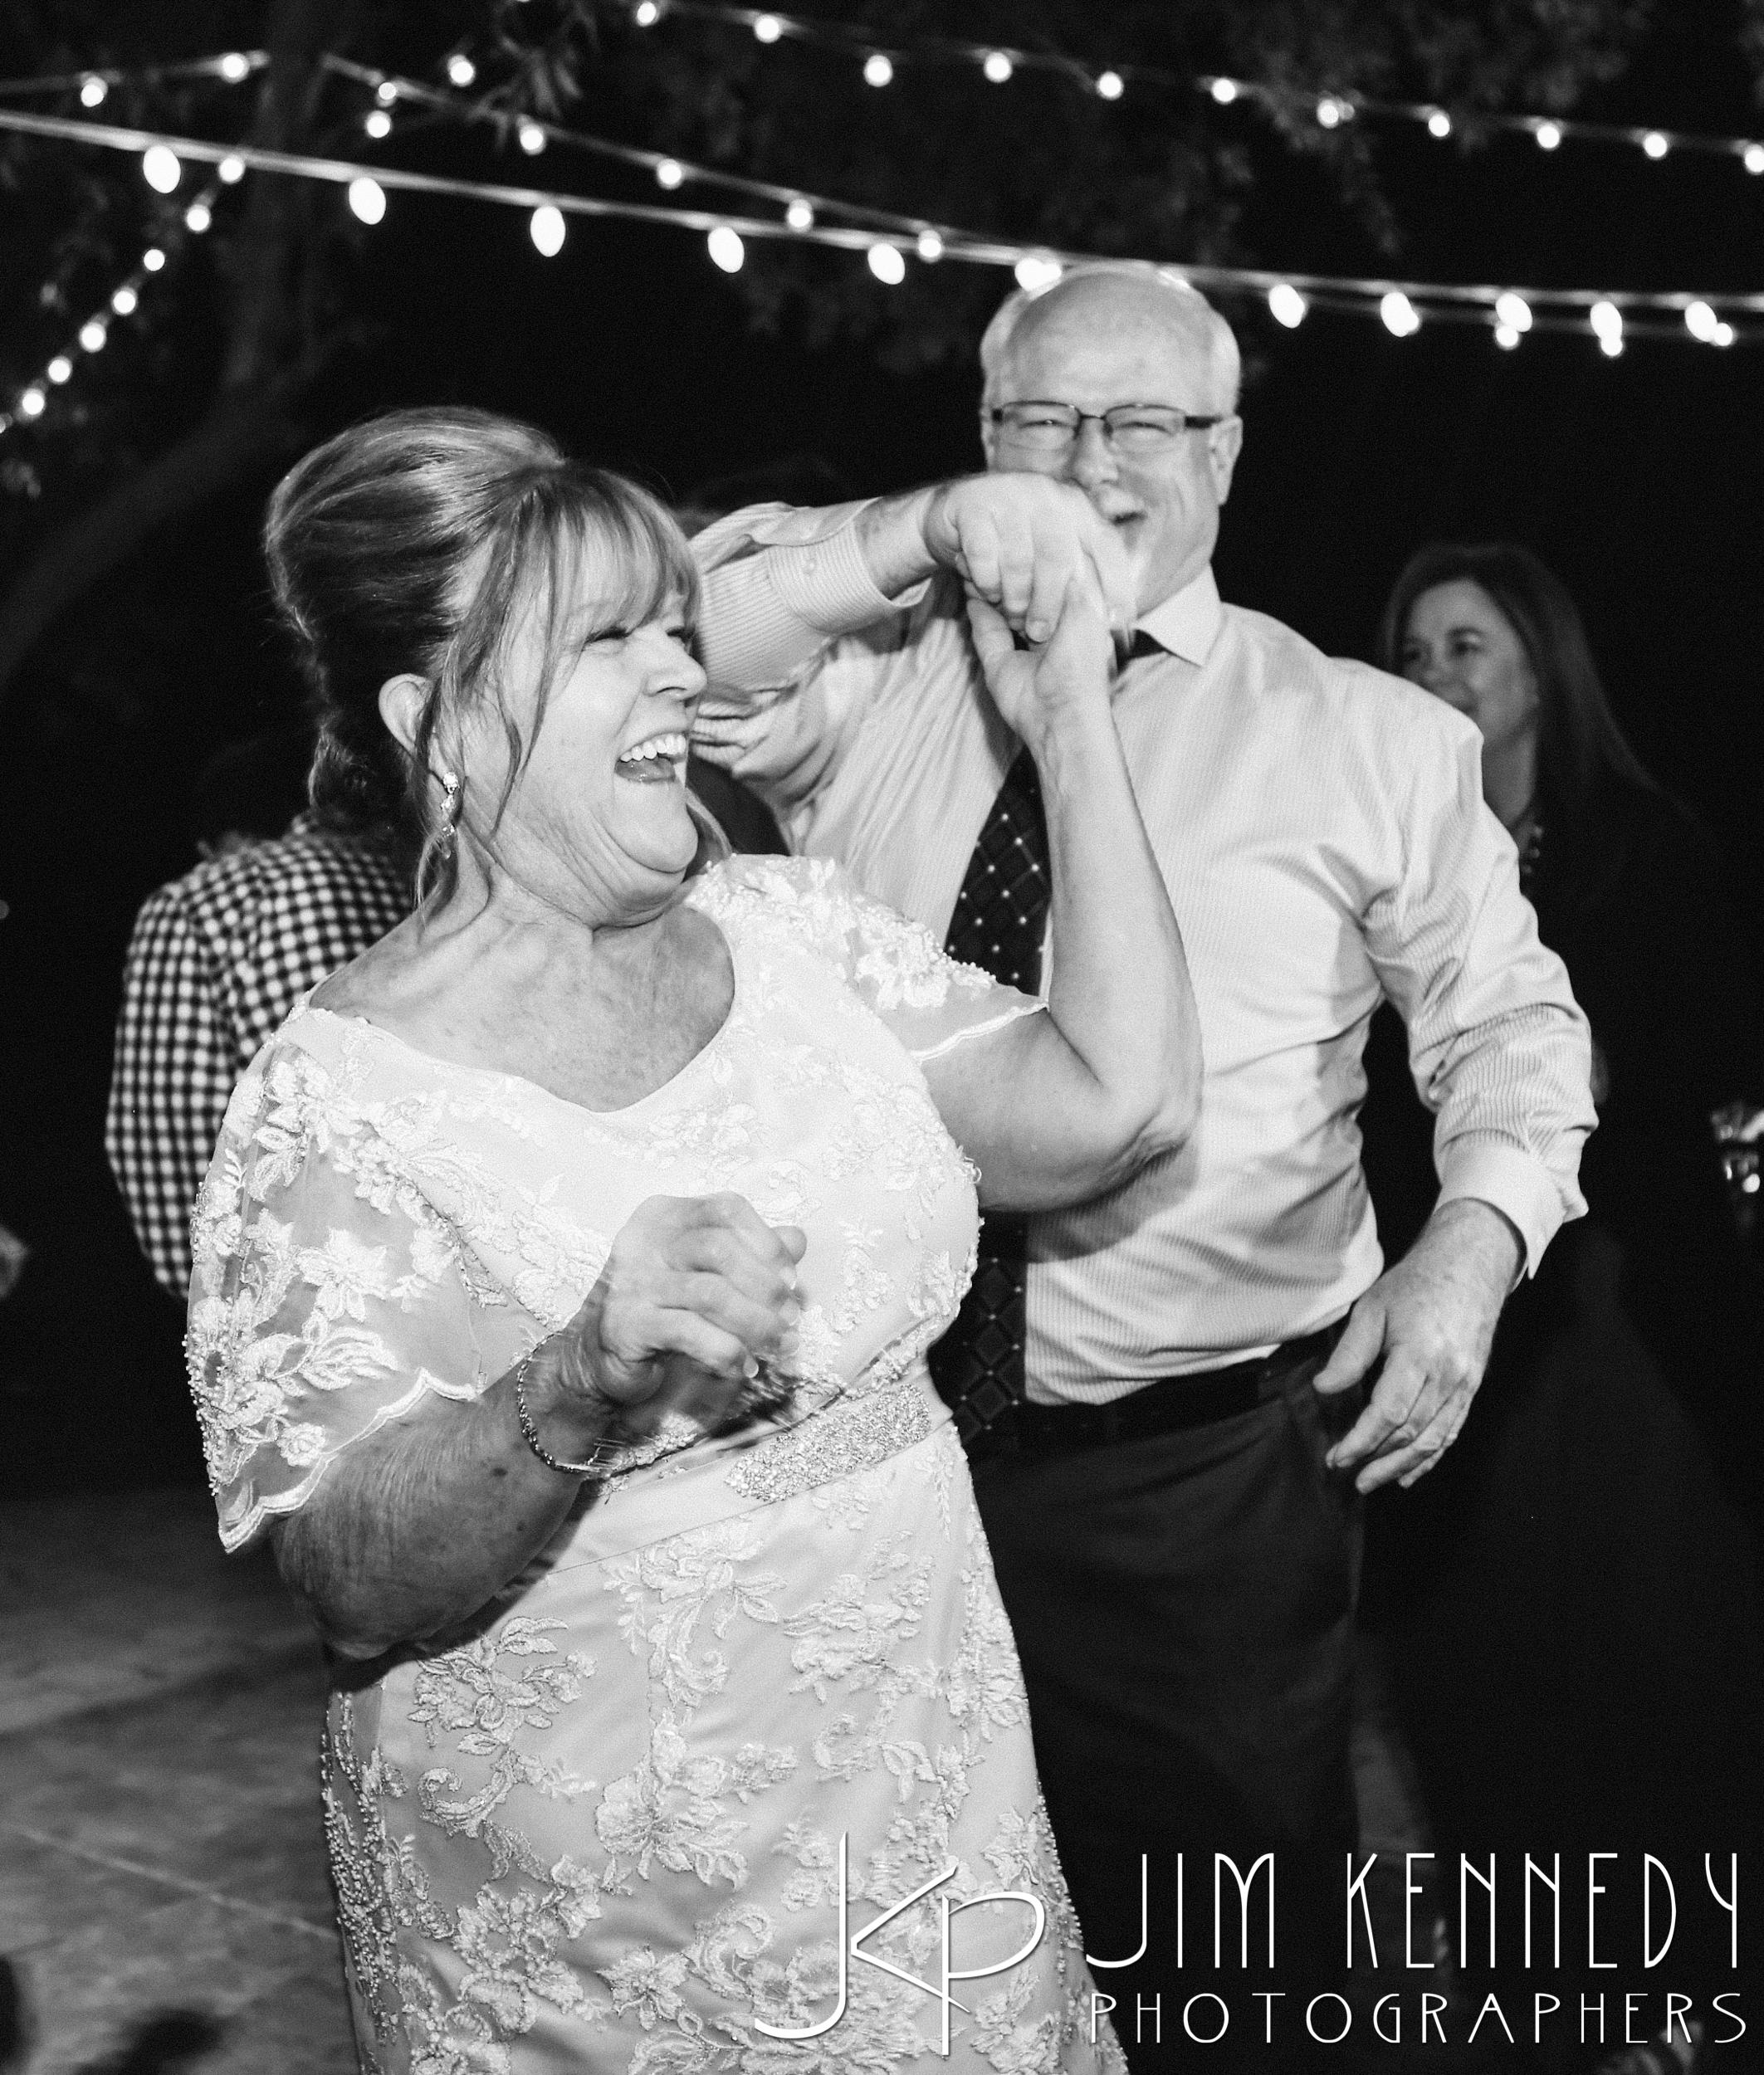 jim_kennedy_photographers_highland_springs_wedding_caitlyn_0191.jpg